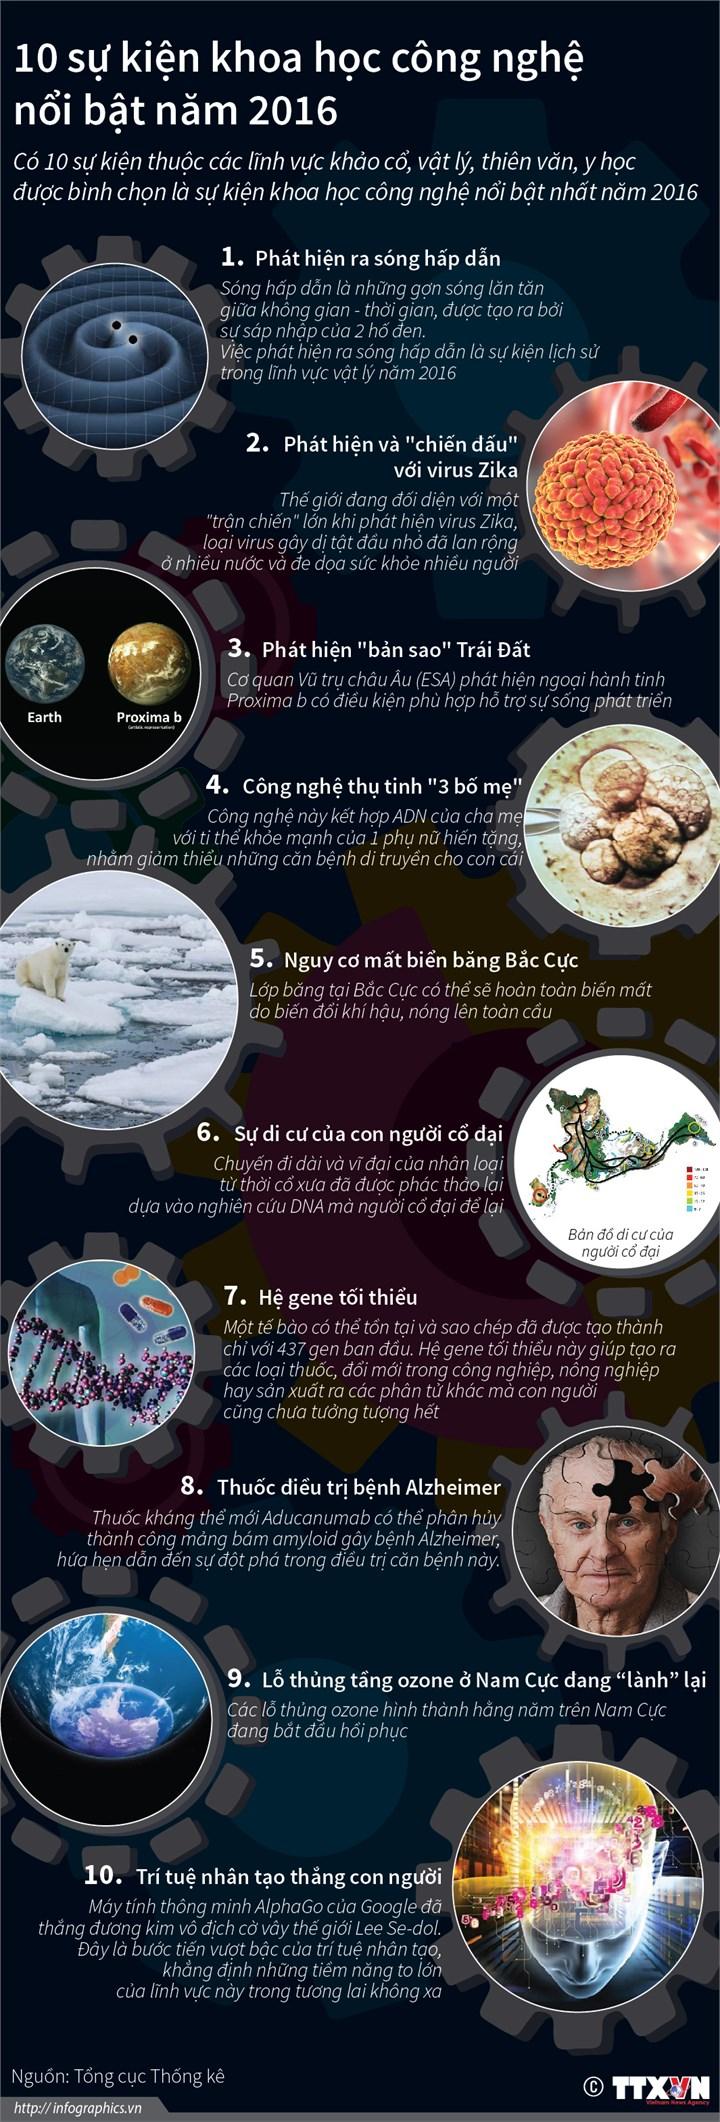 [Infographics] 10 su kien khoa hoc cong nghe noi bat the gioi nam 2016 hinh anh 1